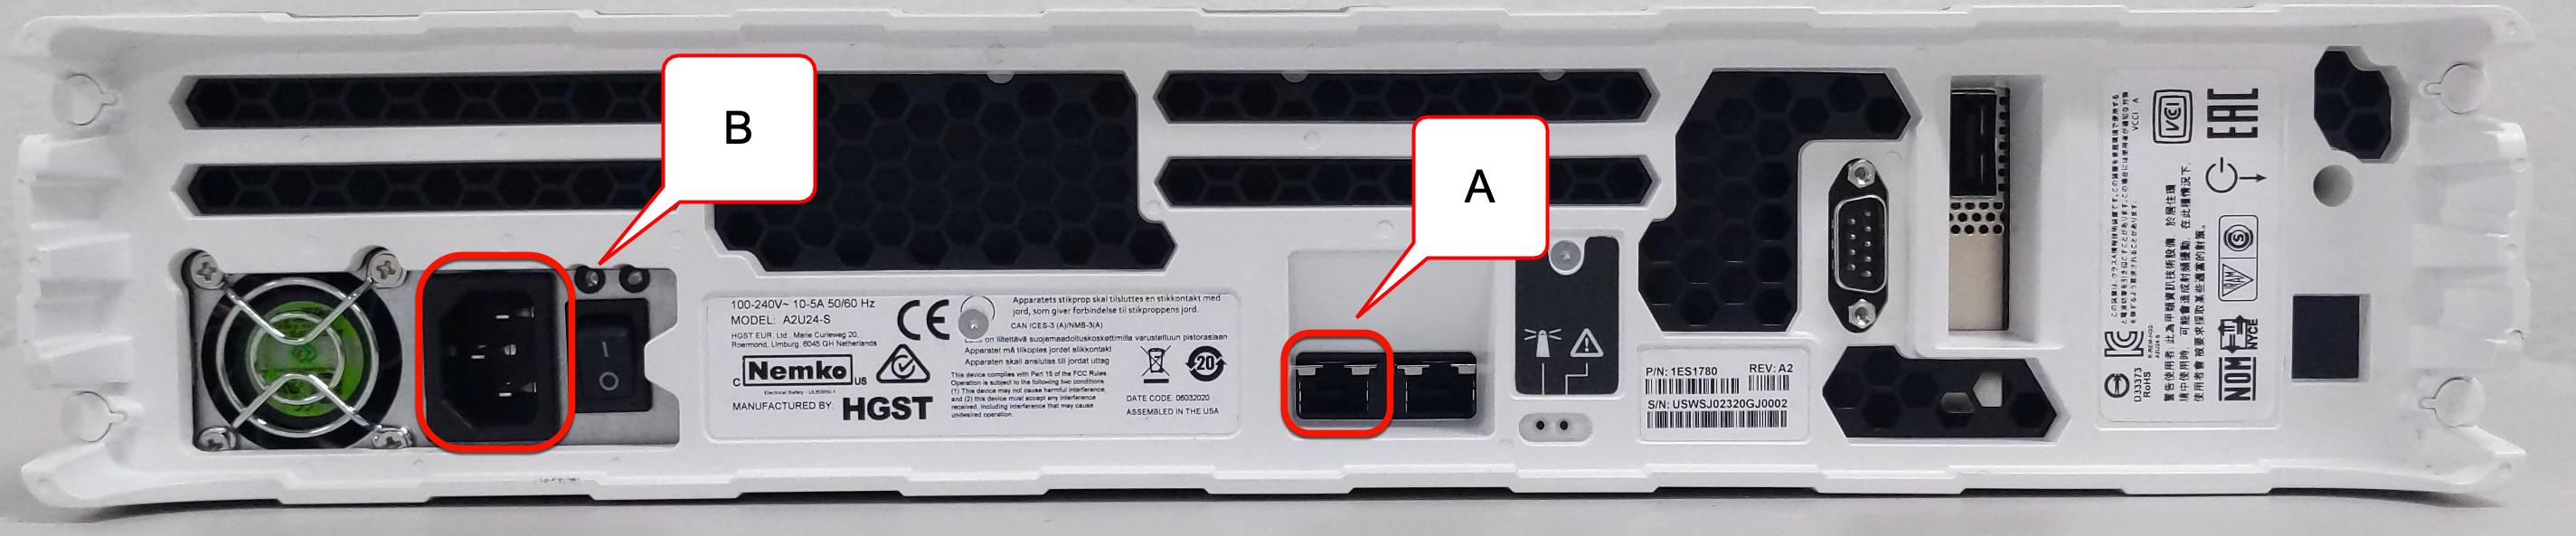 Transfer Appliance のケーブル接続